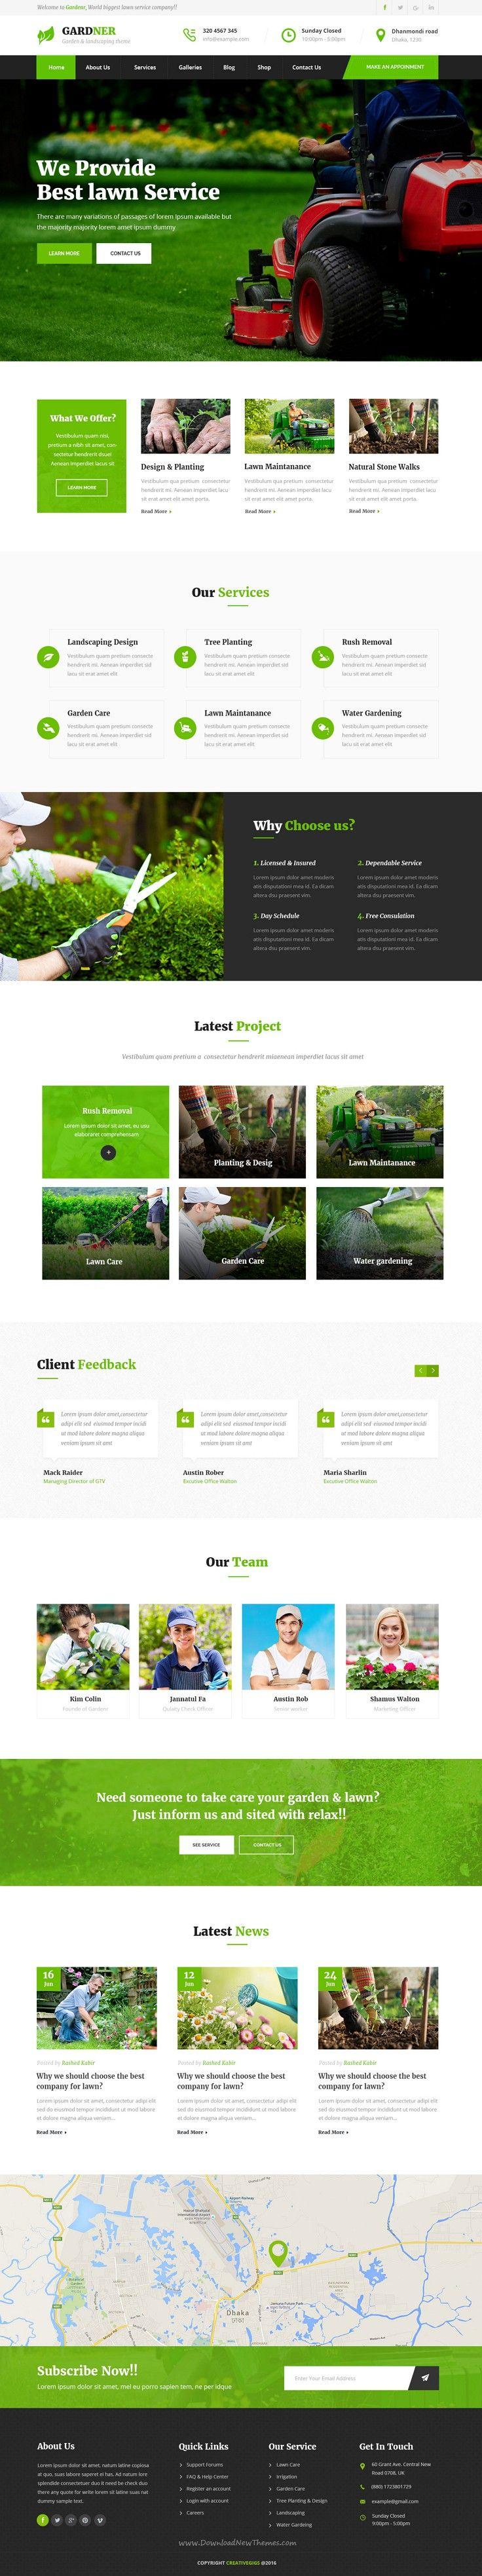 Gardner Garden Landscaping Psd Template Web Layout Design Modern Landscape Design Design